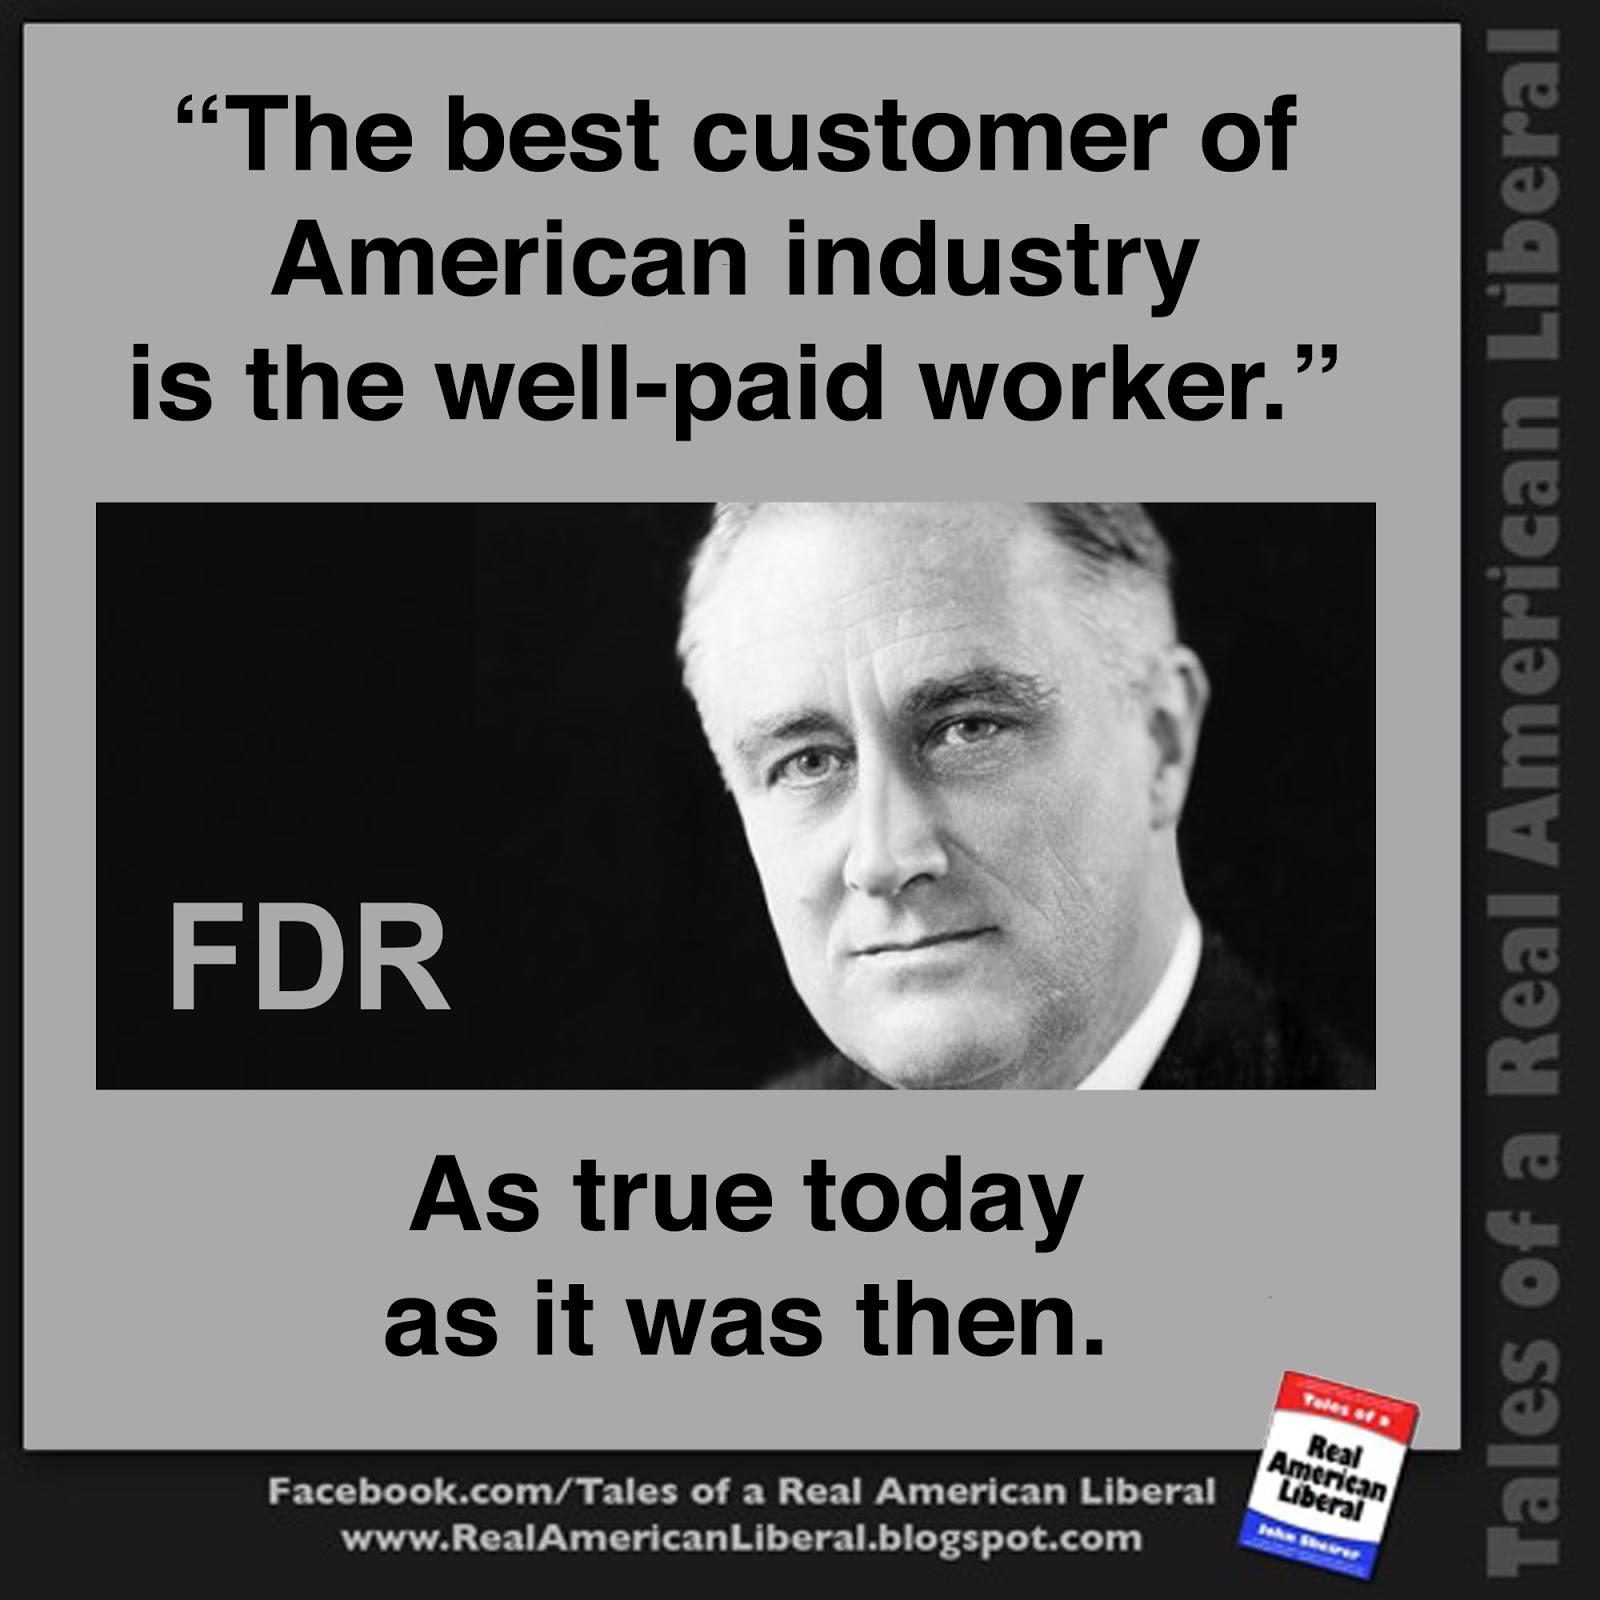 A zero wage increase again case